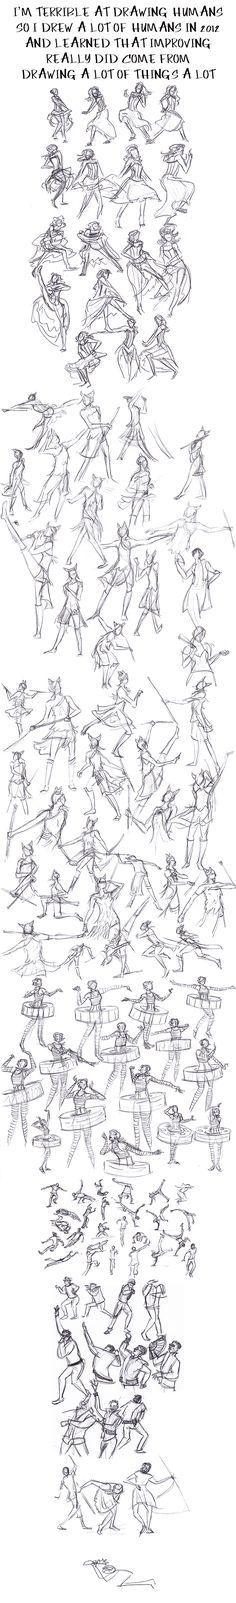 "#Tutorial ""Human Gesture Practice/Studies"" by Hnilmik.deviantart.com on #deviantART"